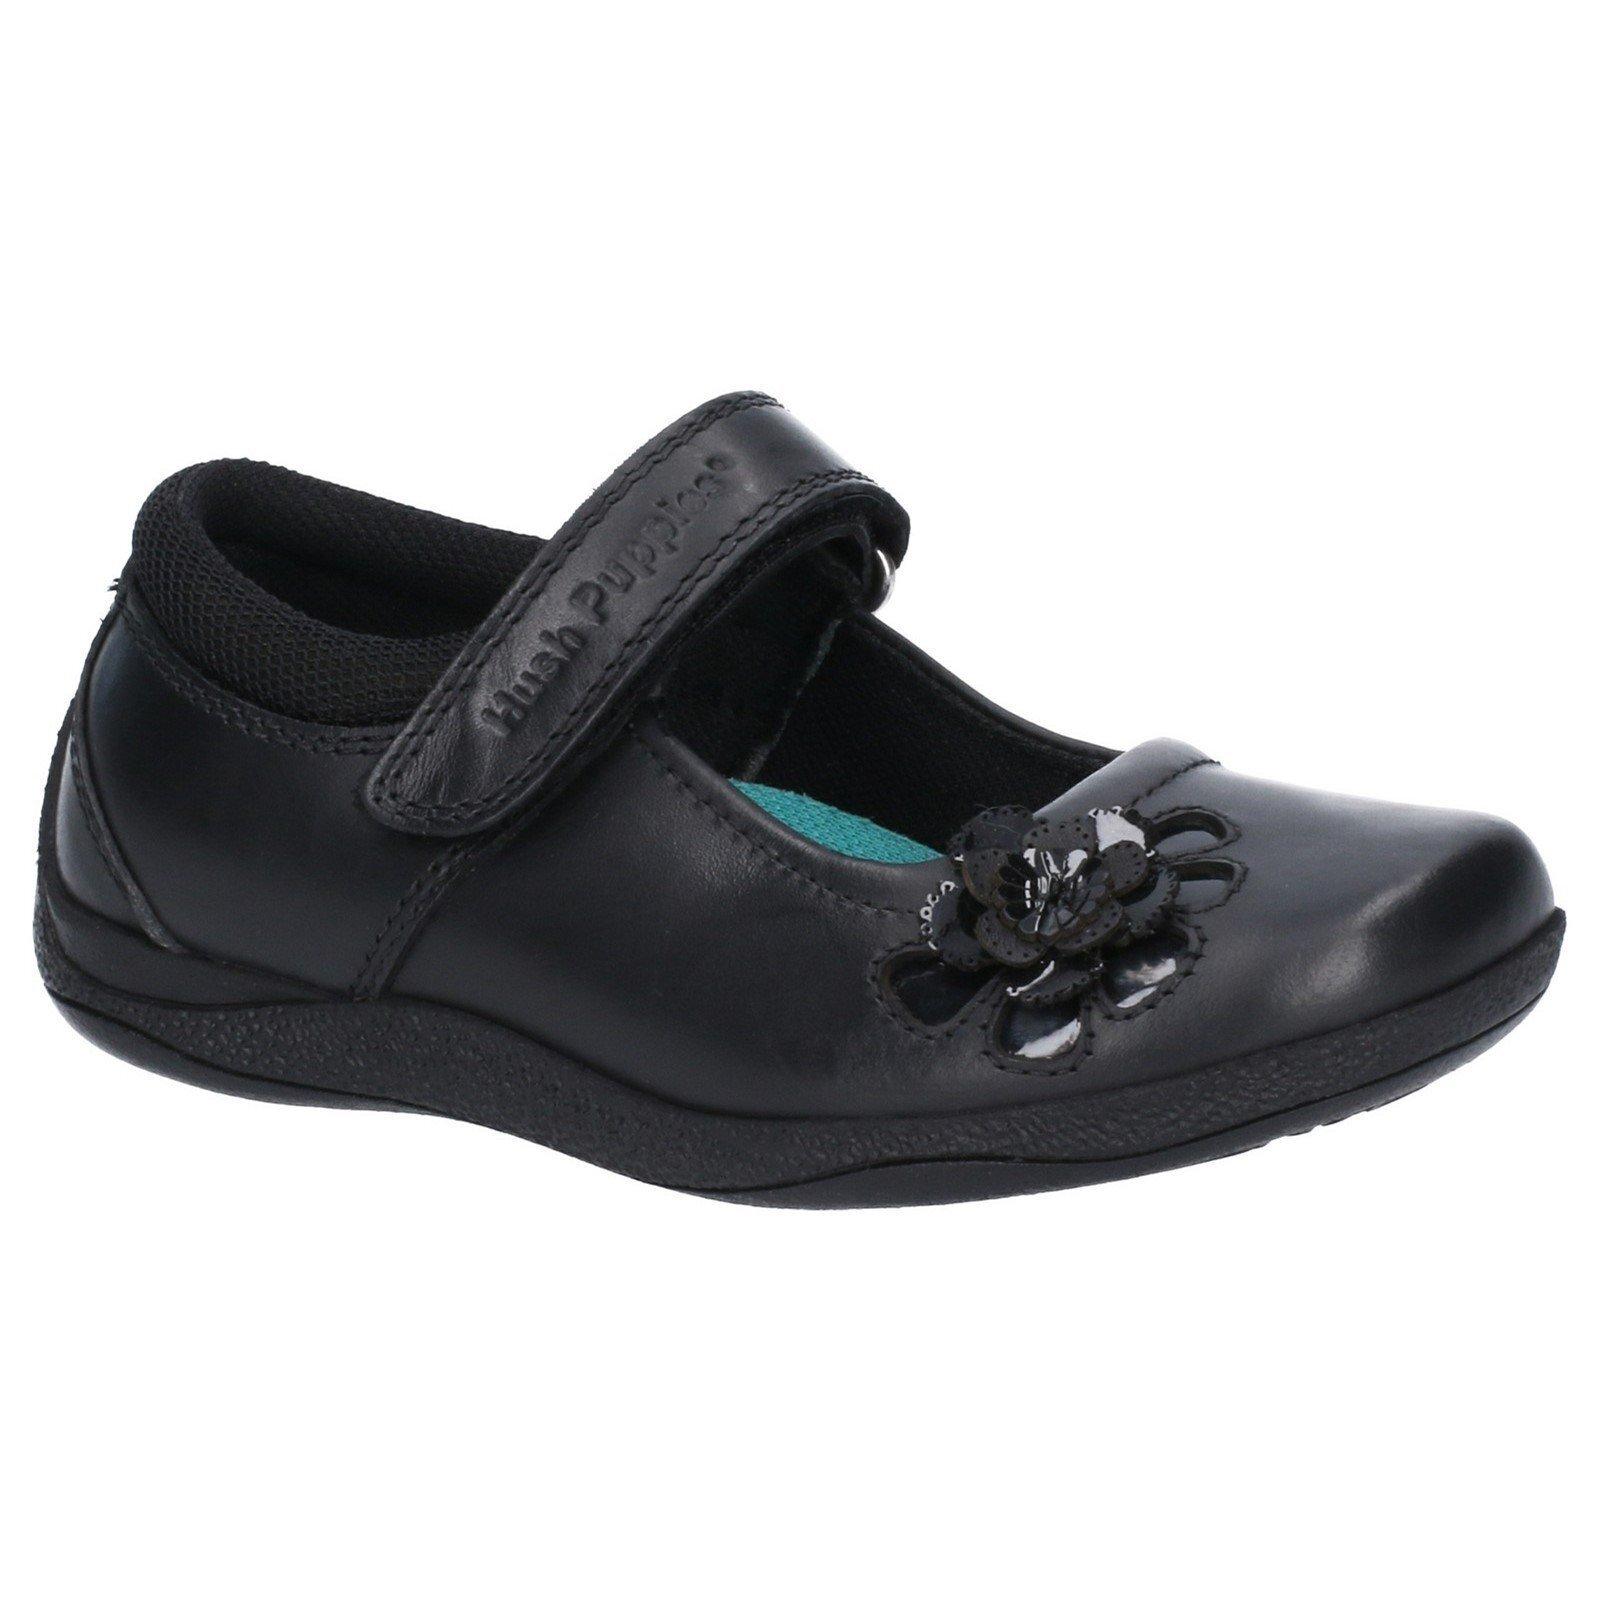 Hush Puppies Girls Jessica Patent Leather School Shoe (6.5 UK Child) (Black)